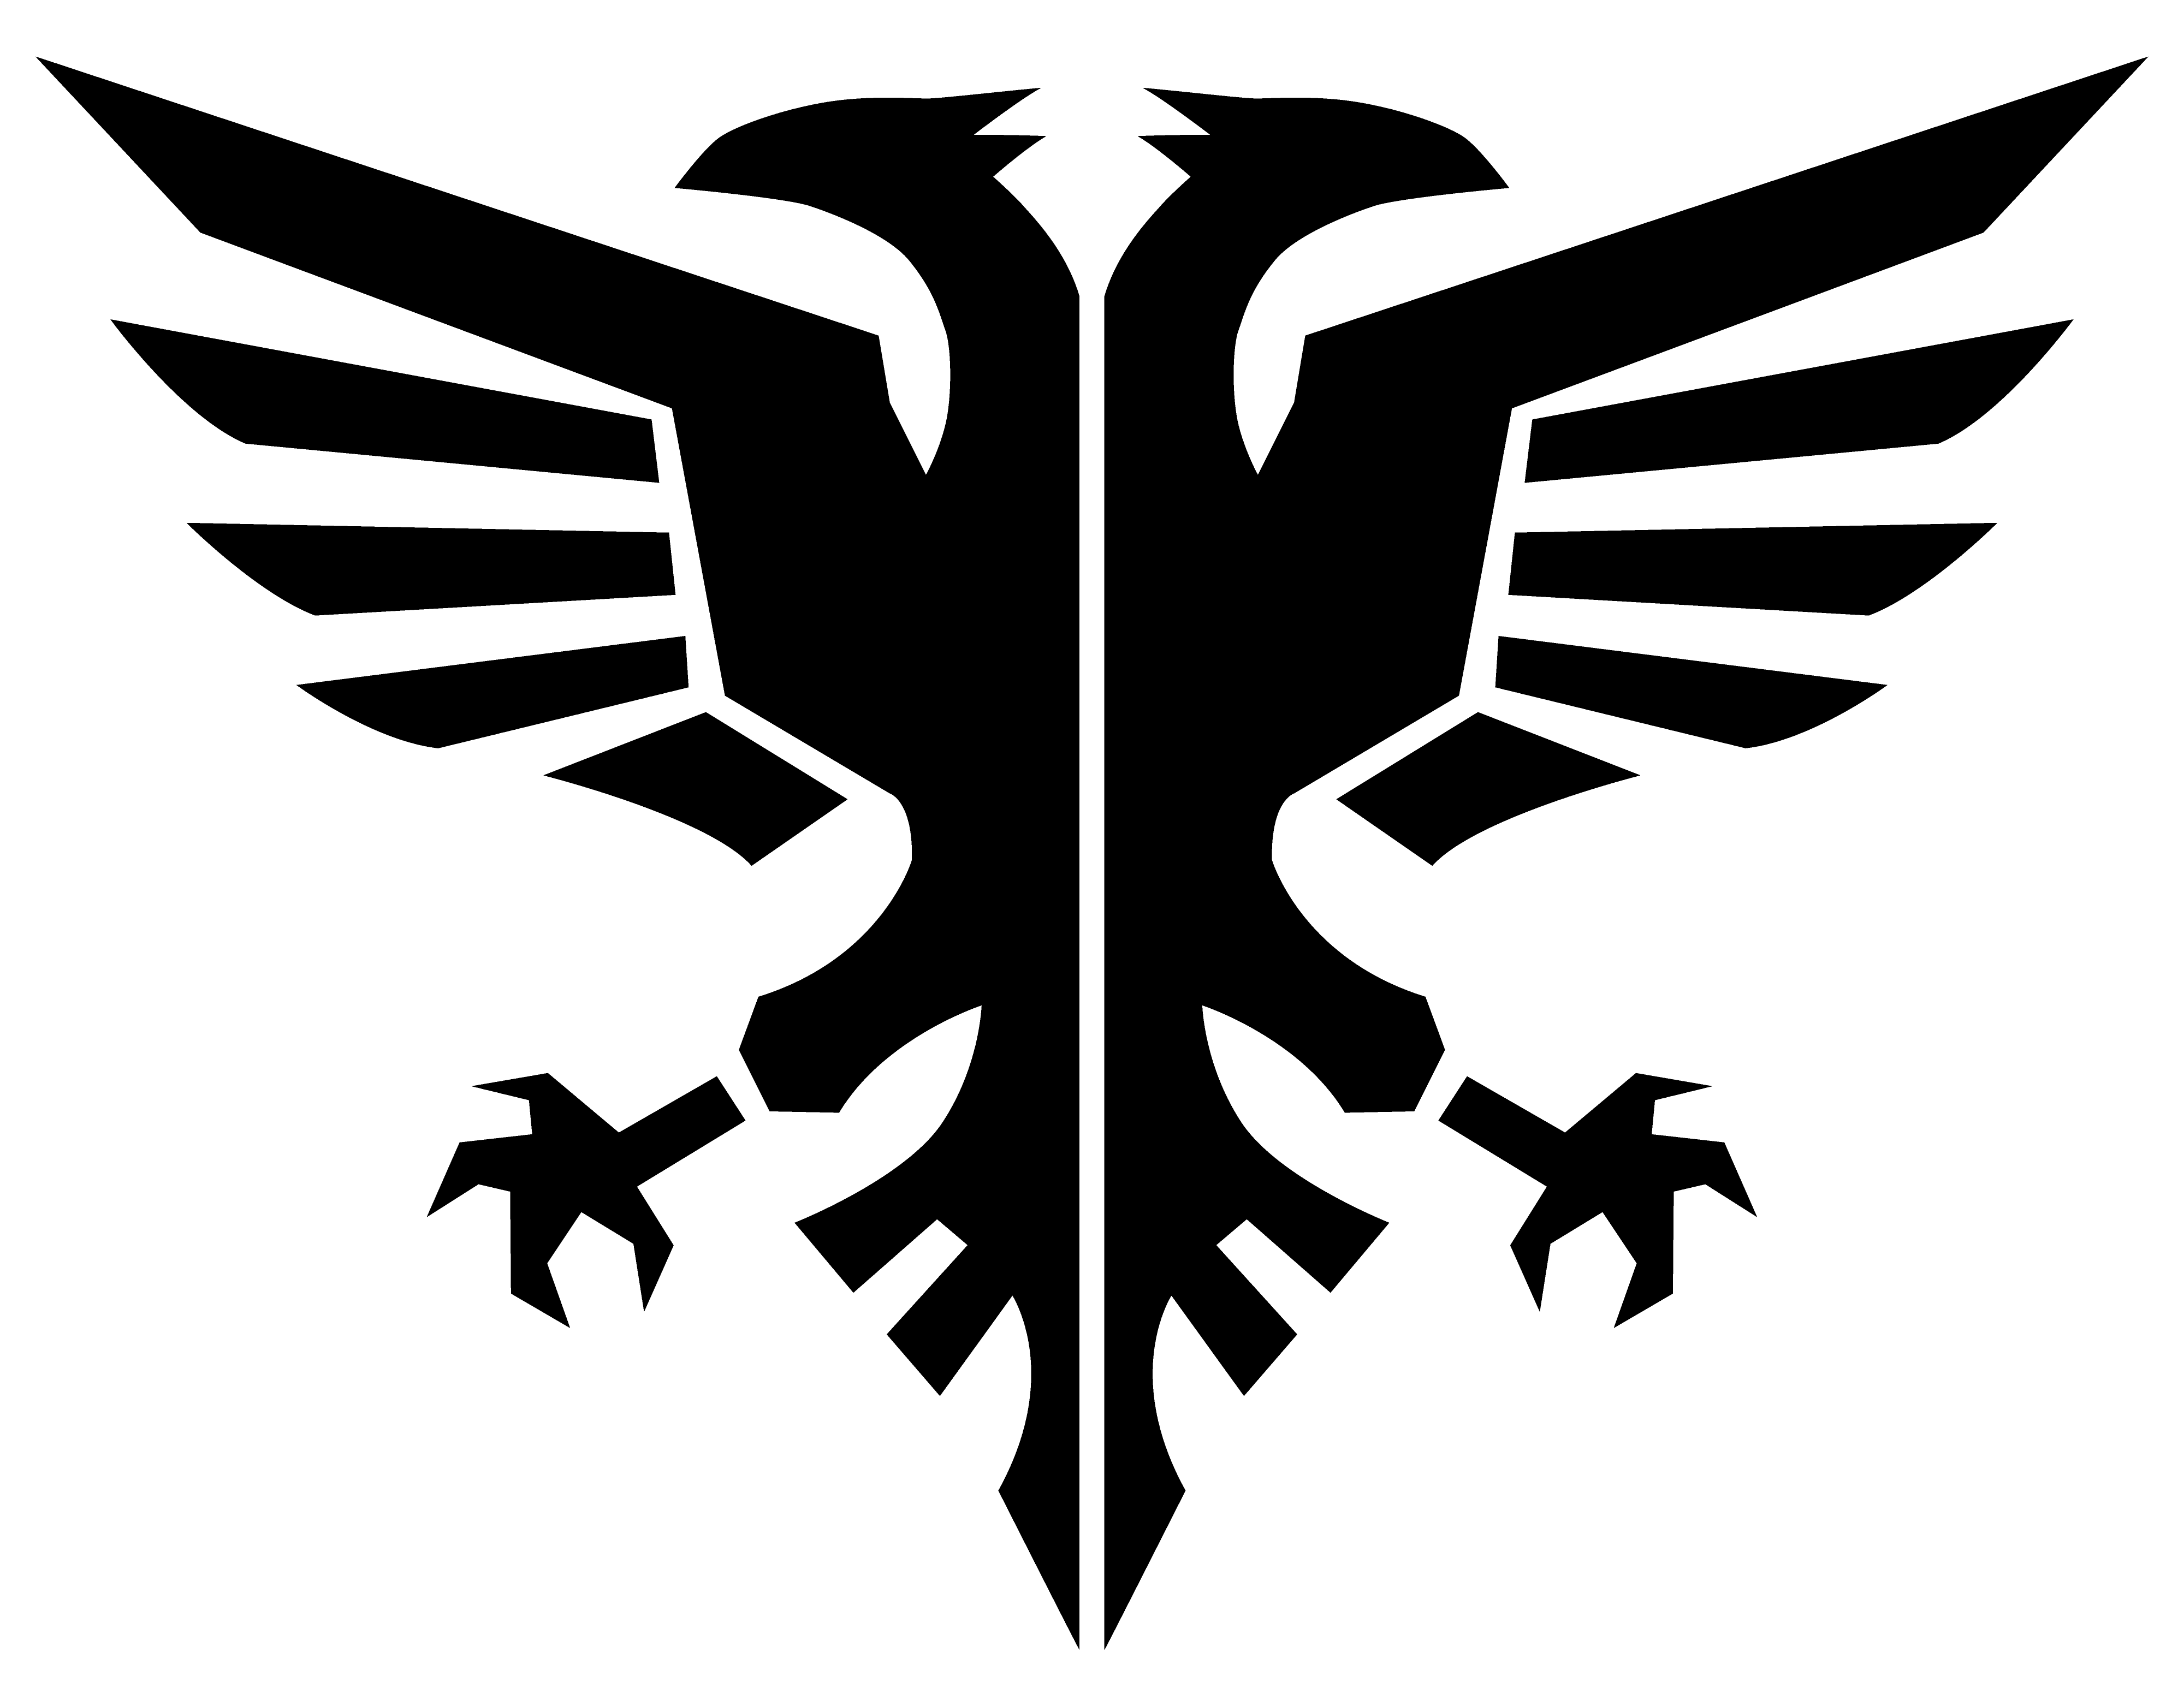 Super Do not upvote] High res Mordu's Legion Logo : Eve WA09